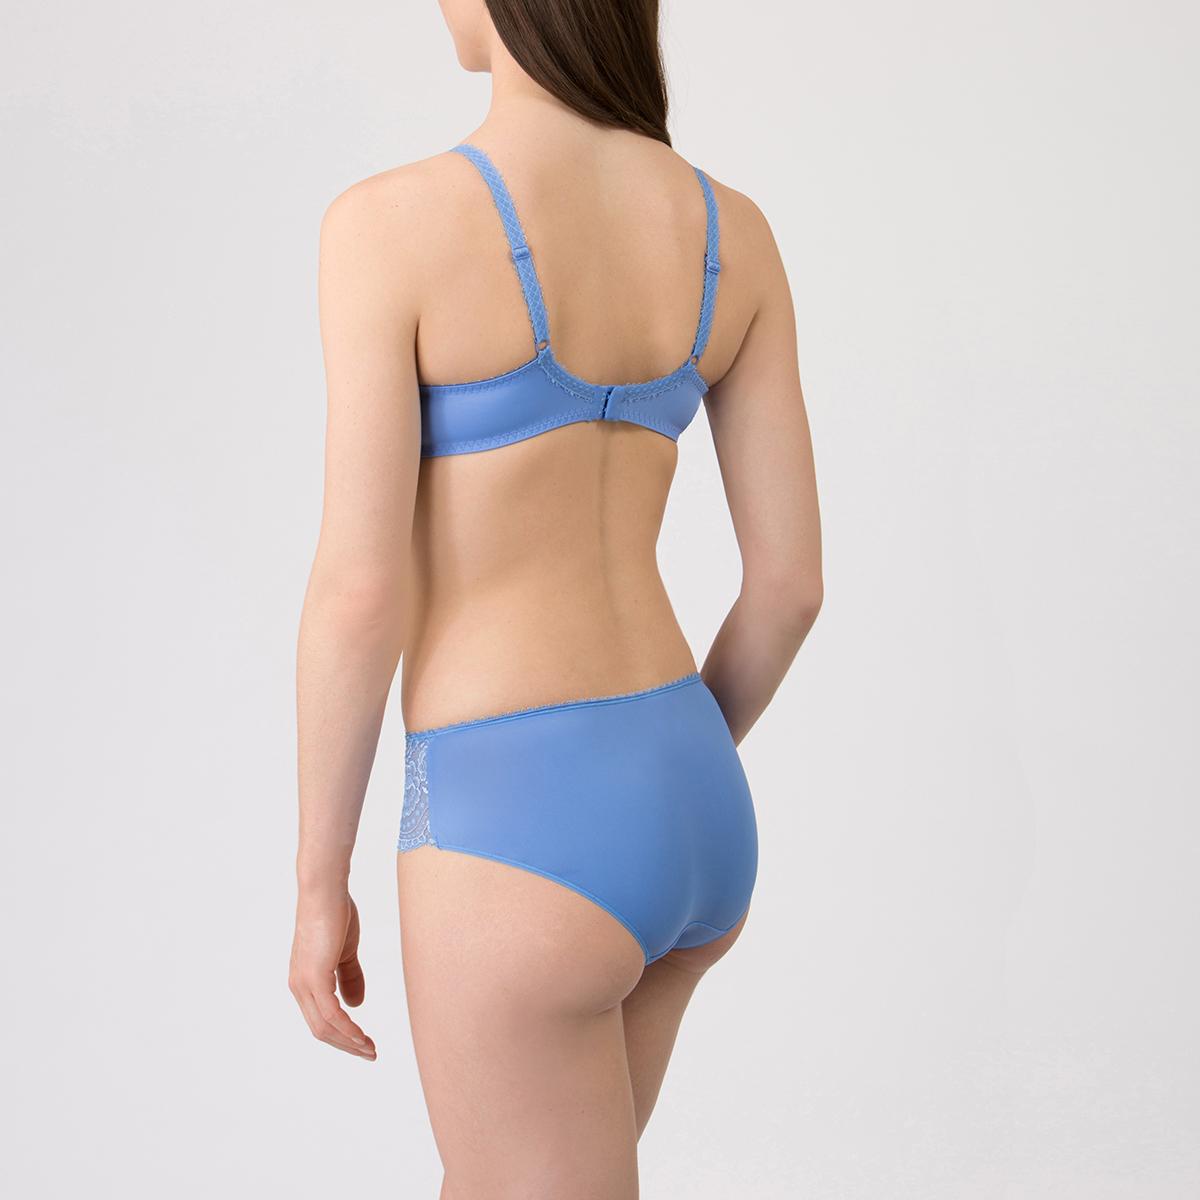 Shorty bleu - Flower Elegance-PLAYTEX